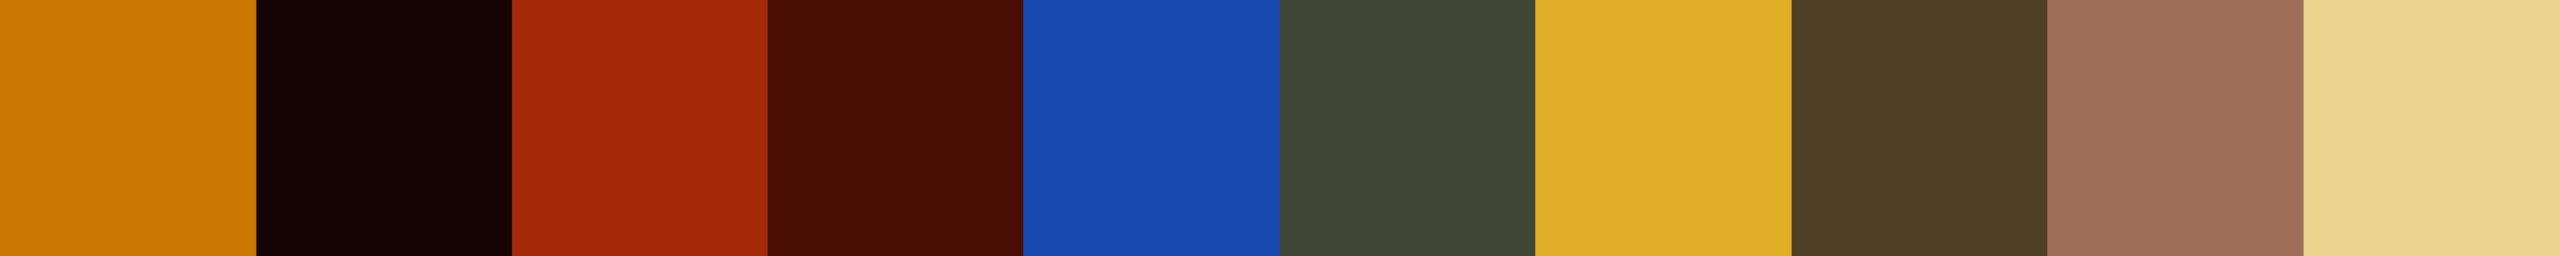 709 Locrahoma Color Palette